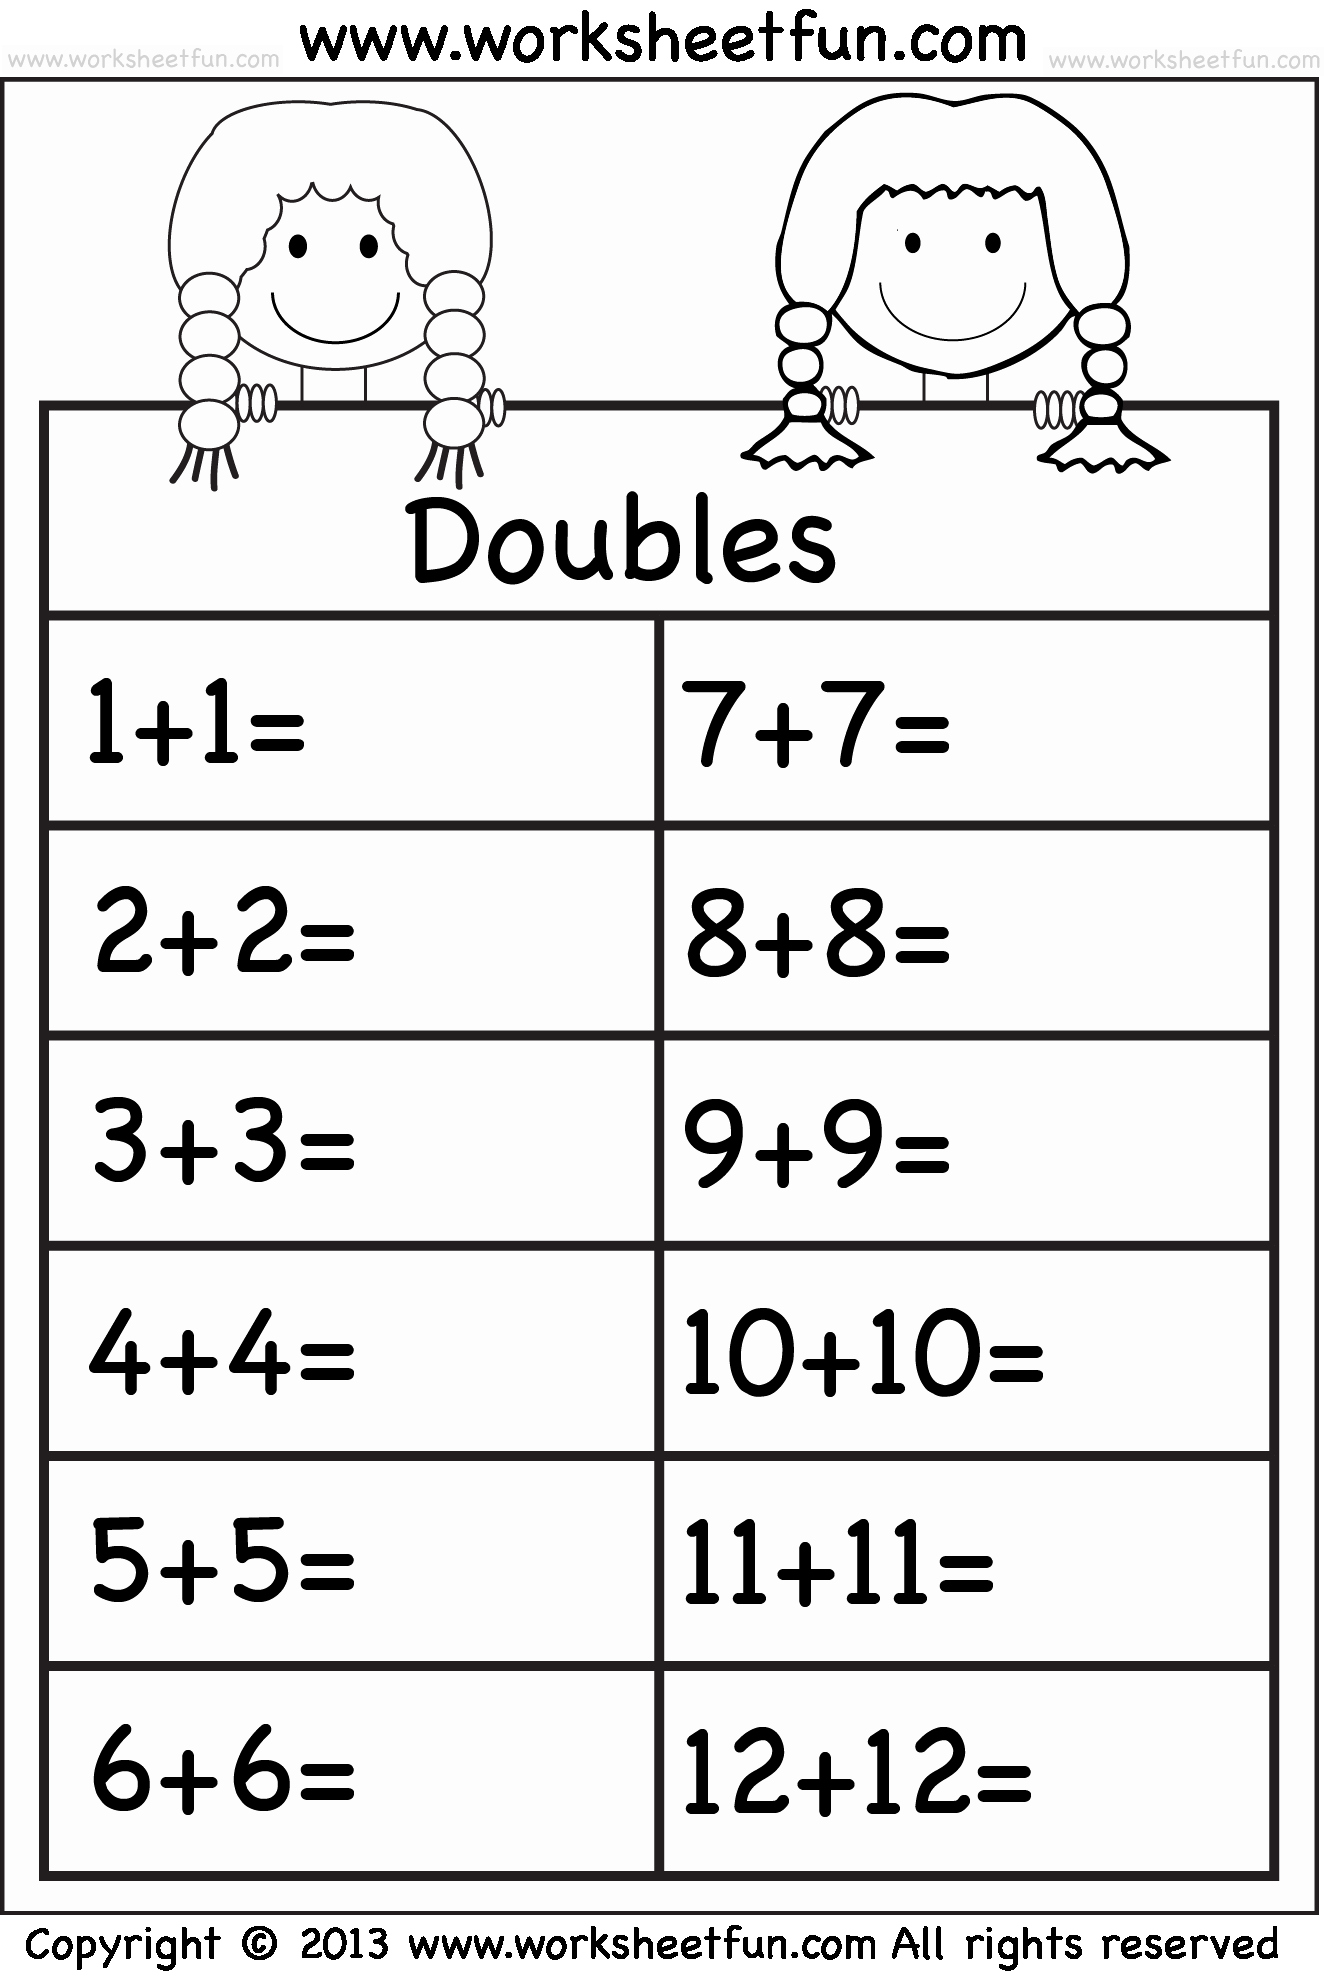 Double Facts Worksheets Elegant Addition Doubles – 1 Worksheet Free Printable Worksheets